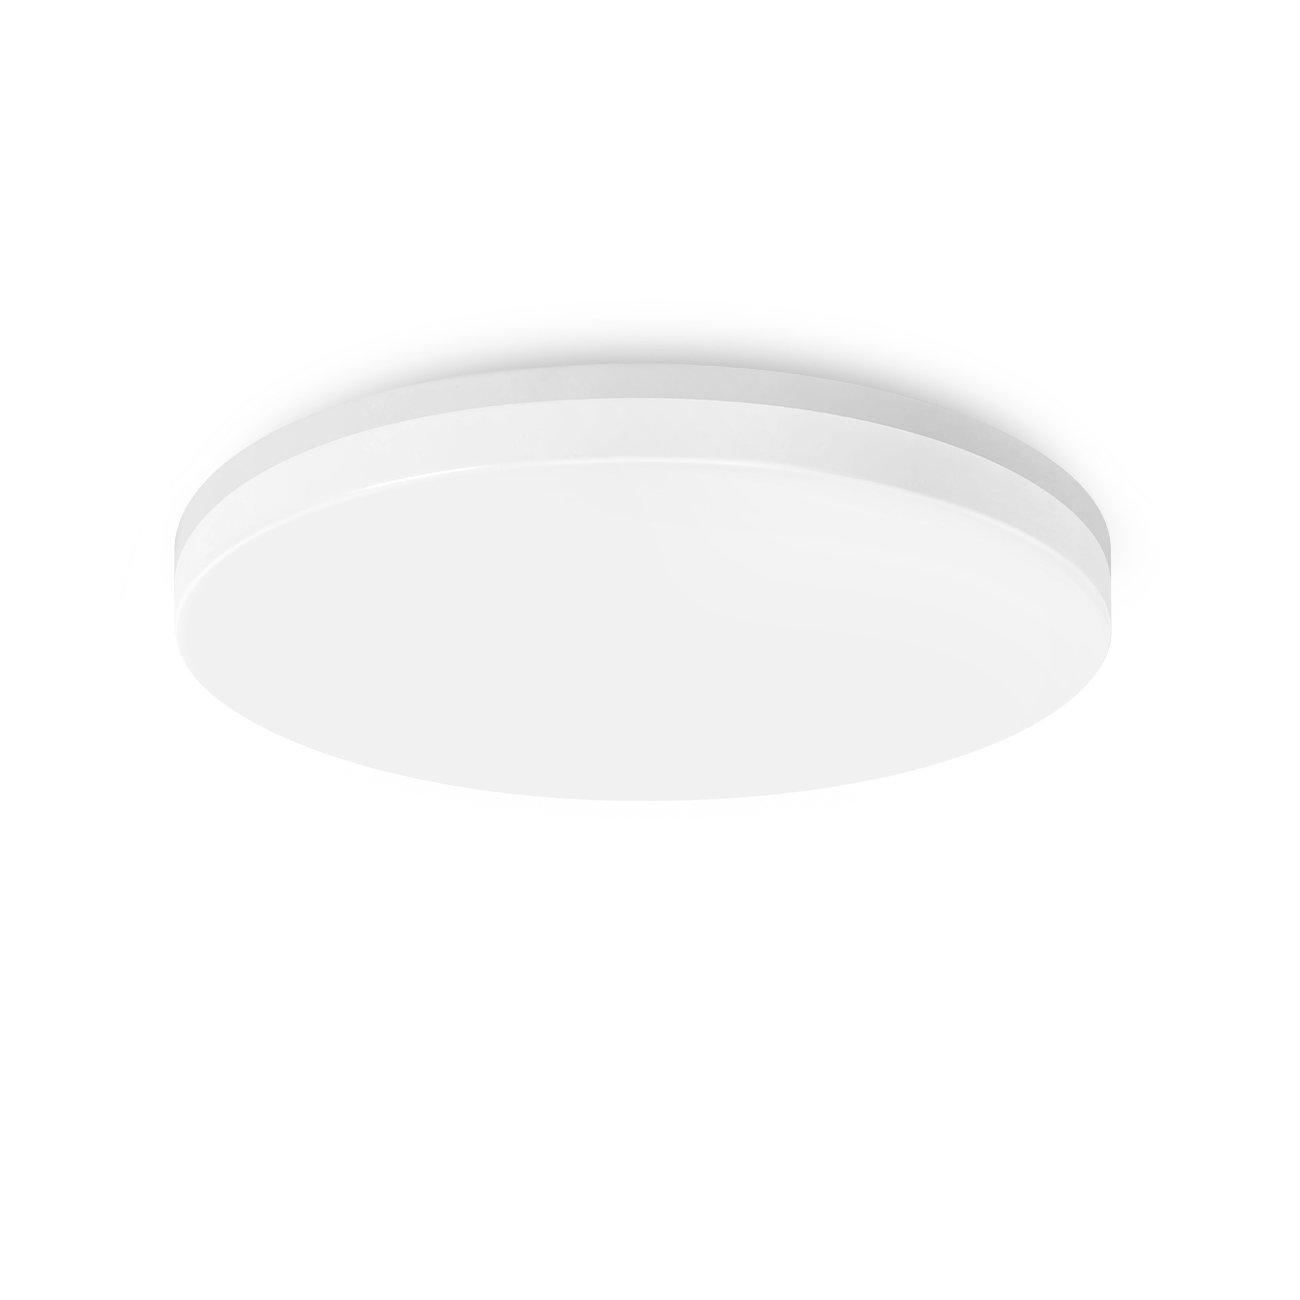 LVWIT Lámpara de Techo LED - 18W, Plafón LED de 1400 lúmenes, Color blanco neutro 4000K, No regulable - oficina salón. [Clase de eficiencia energética A++]